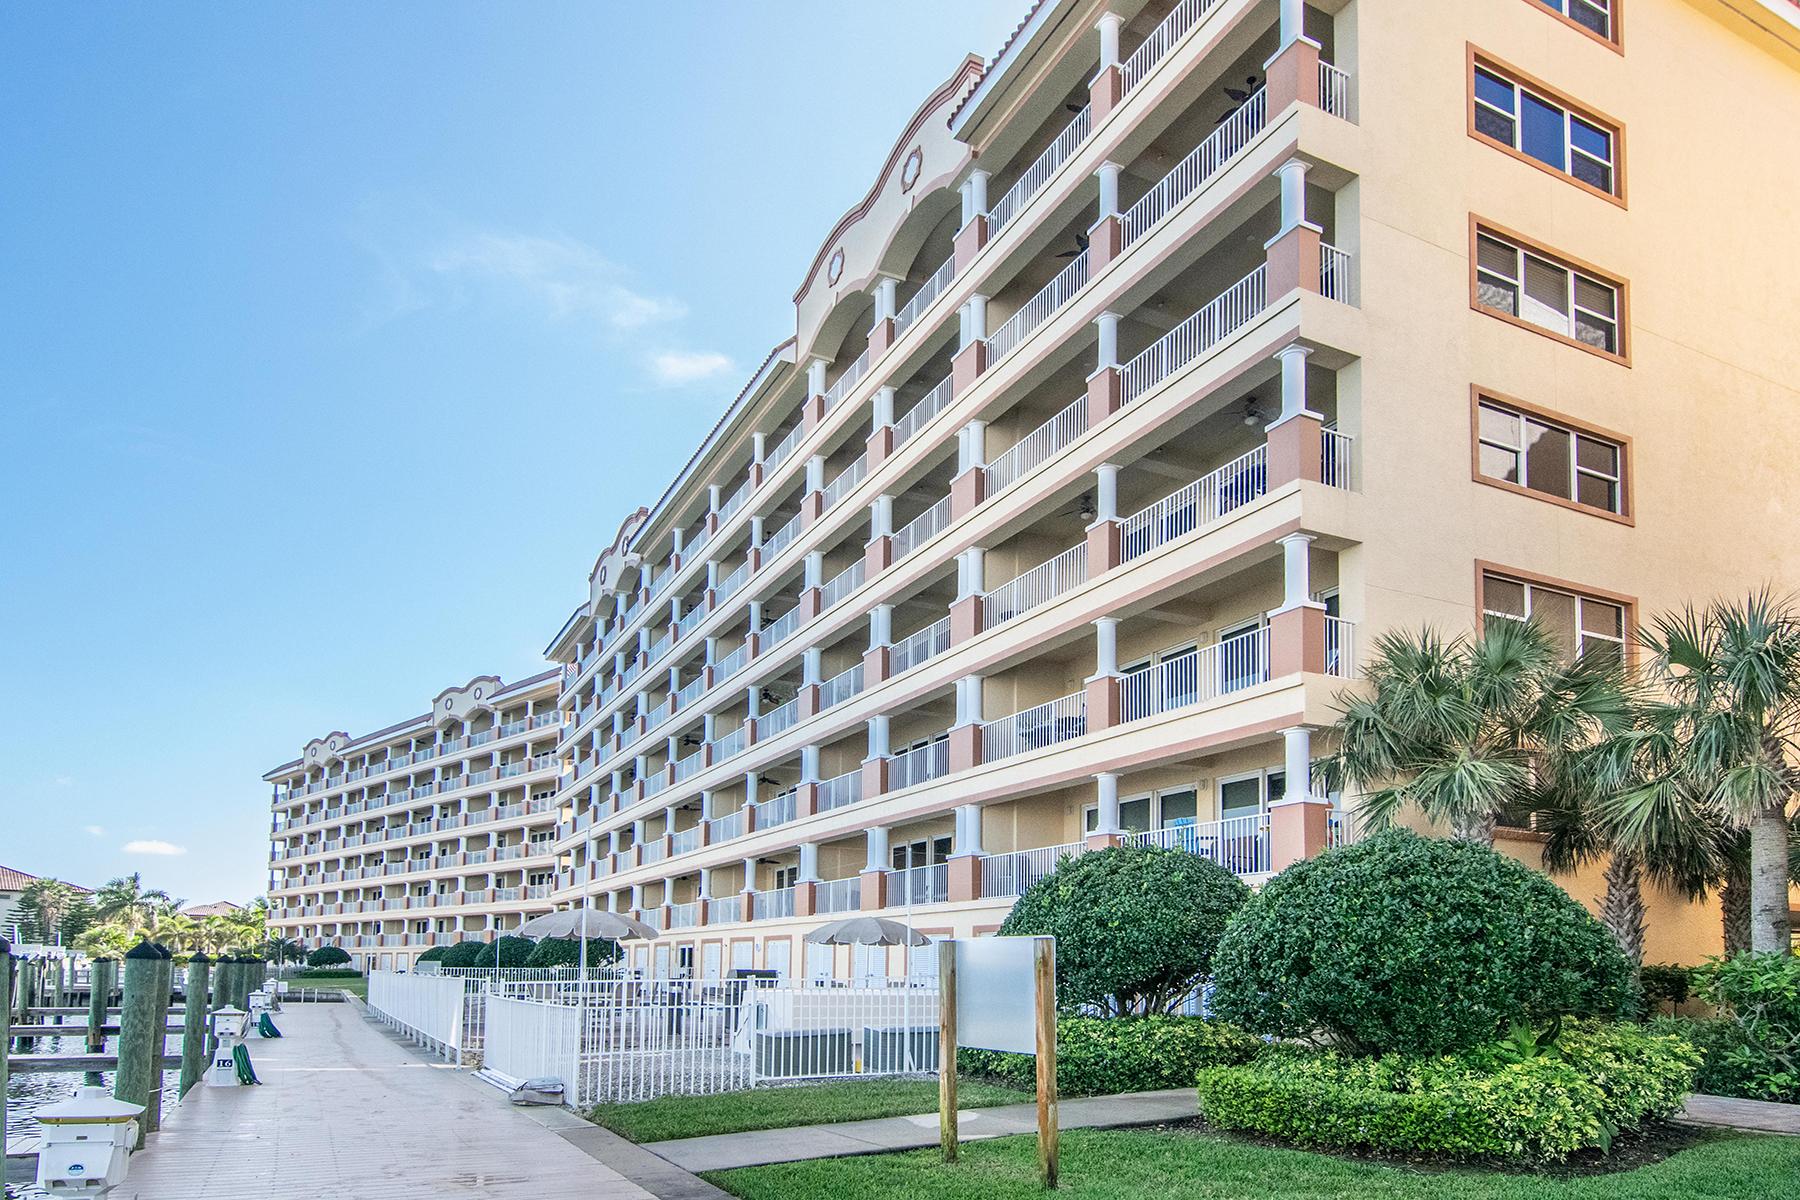 Condominiums for Sale at REDINGTON SHORES 17735 Gulf Blvd , 701 Redington Shores, Florida 33708 United States